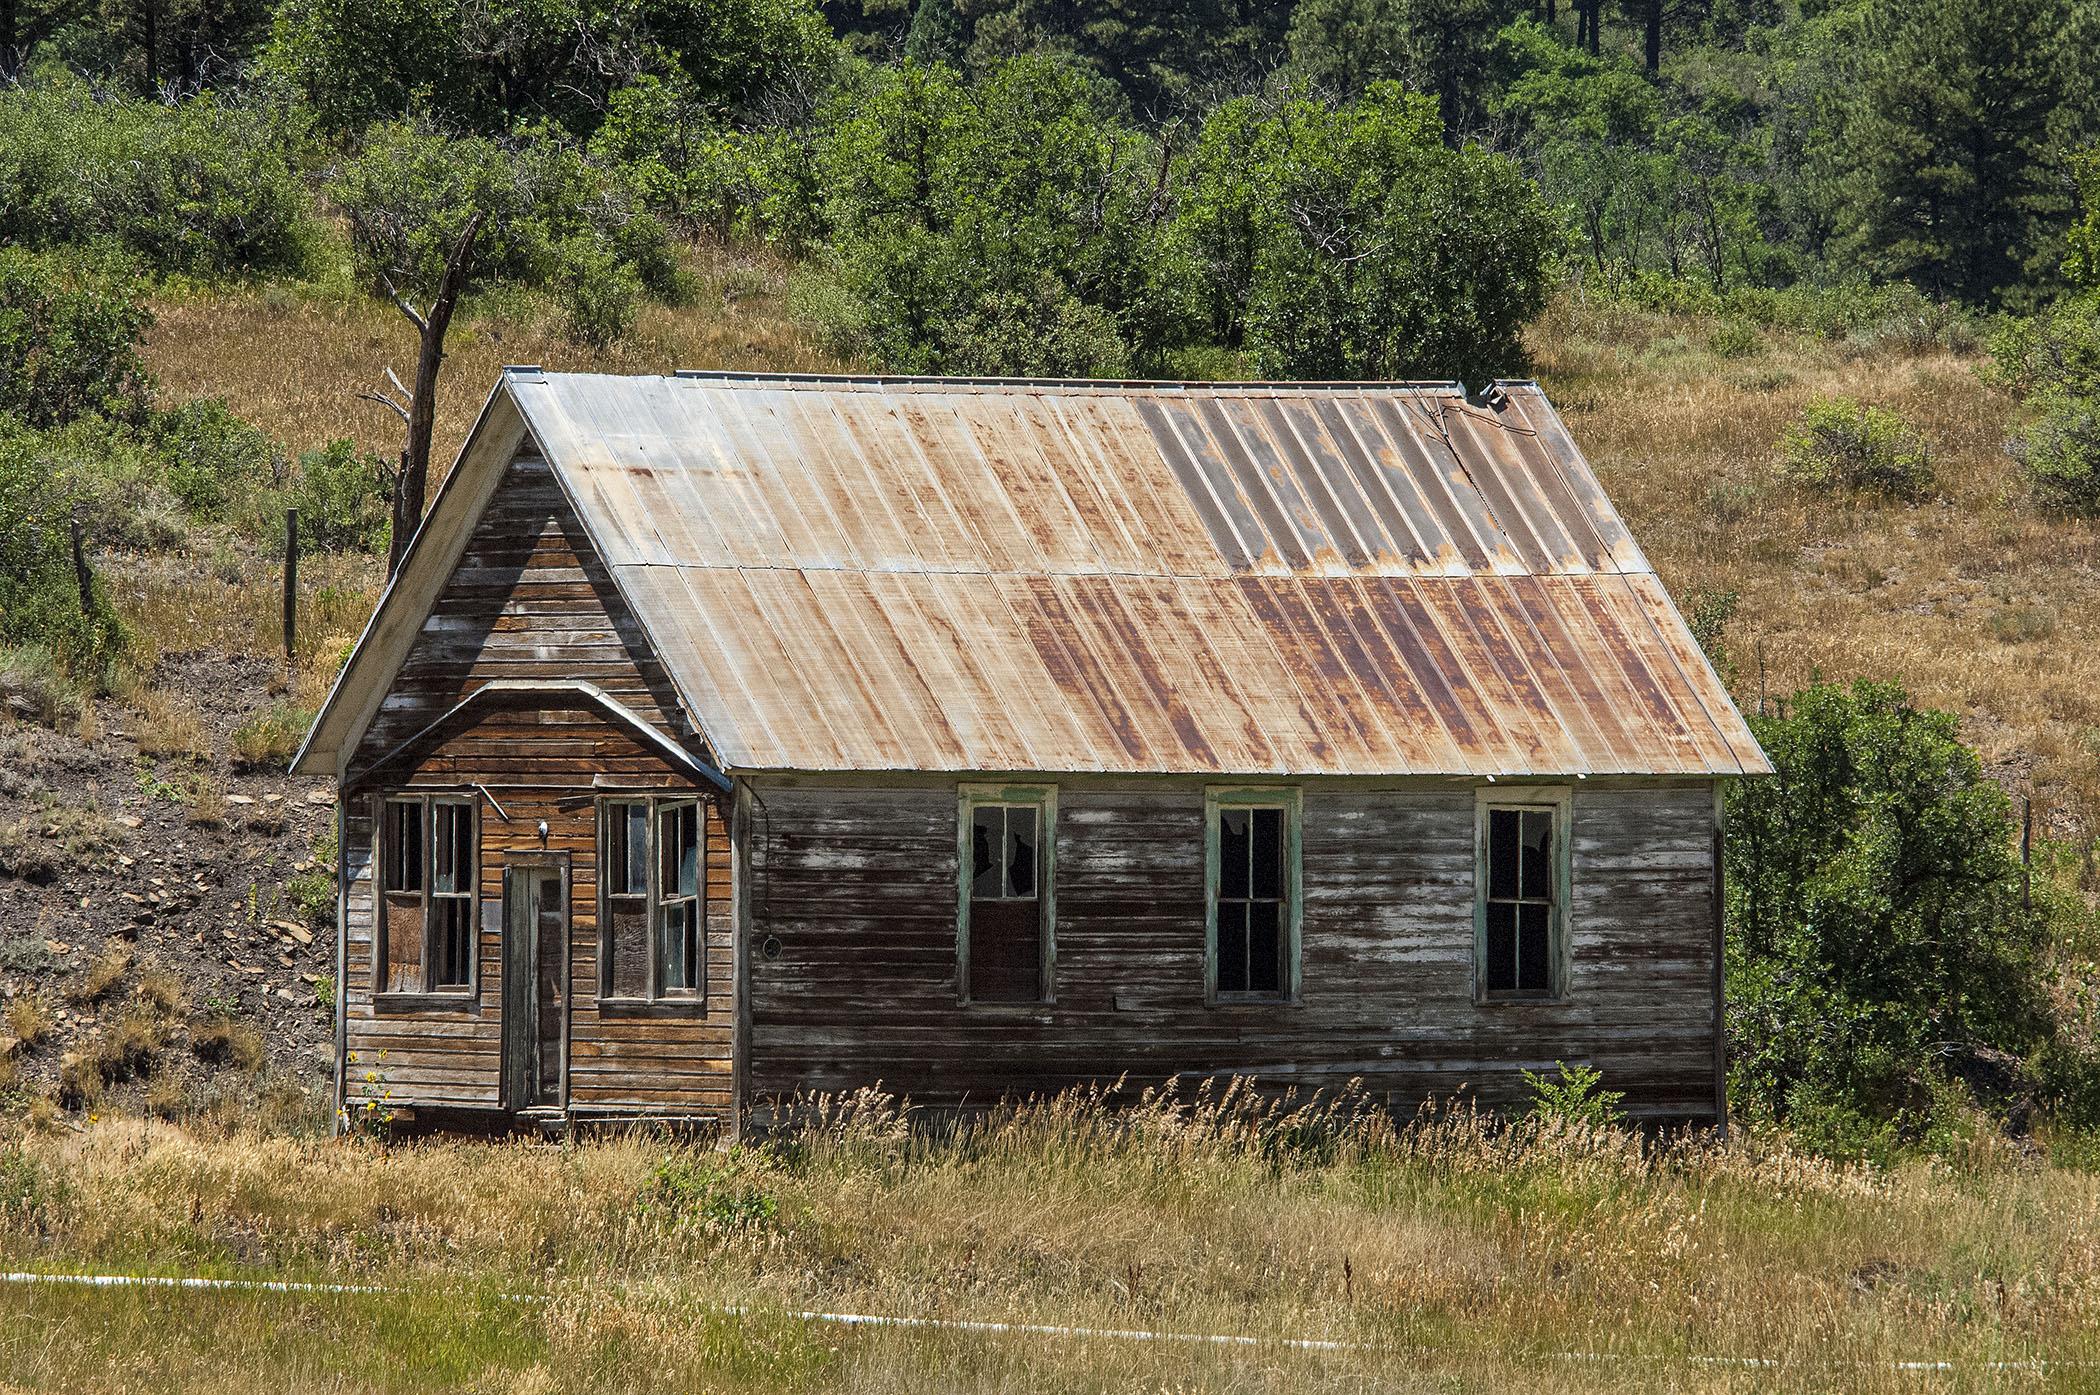 Elaborate-and-Abandoned